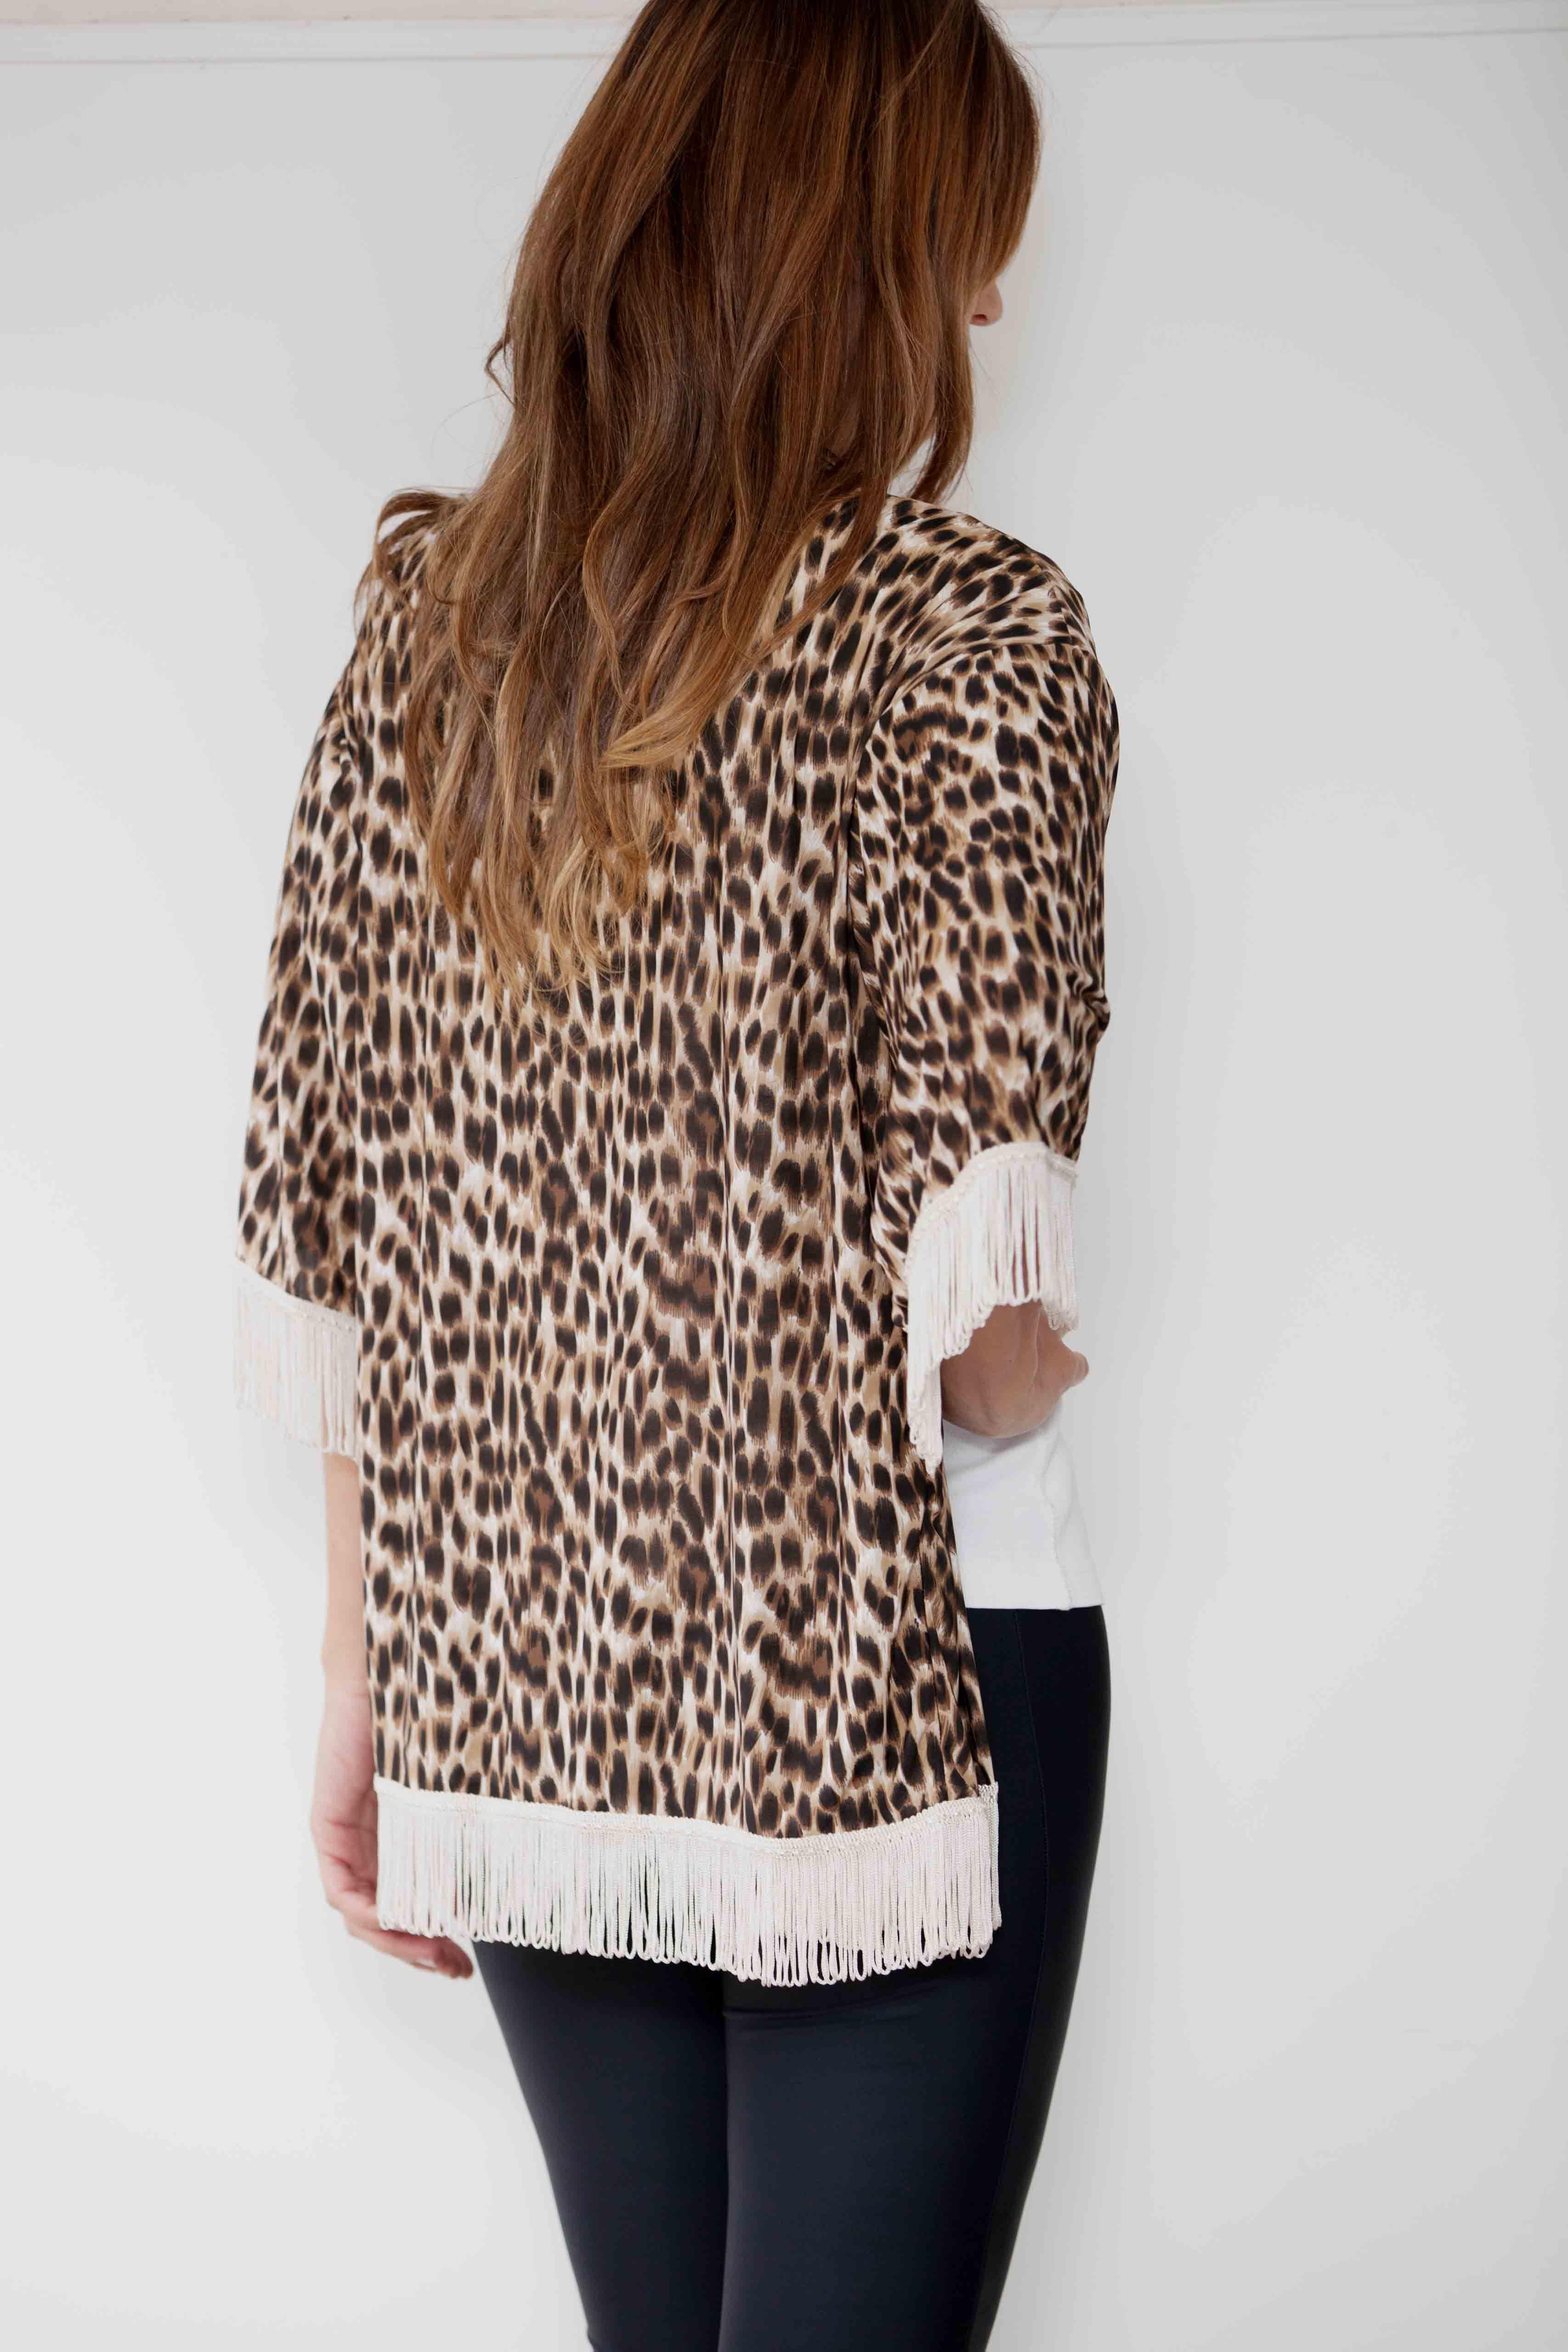 #winteroutfit #fashion #tendencia #invierno #animalprint #flecos